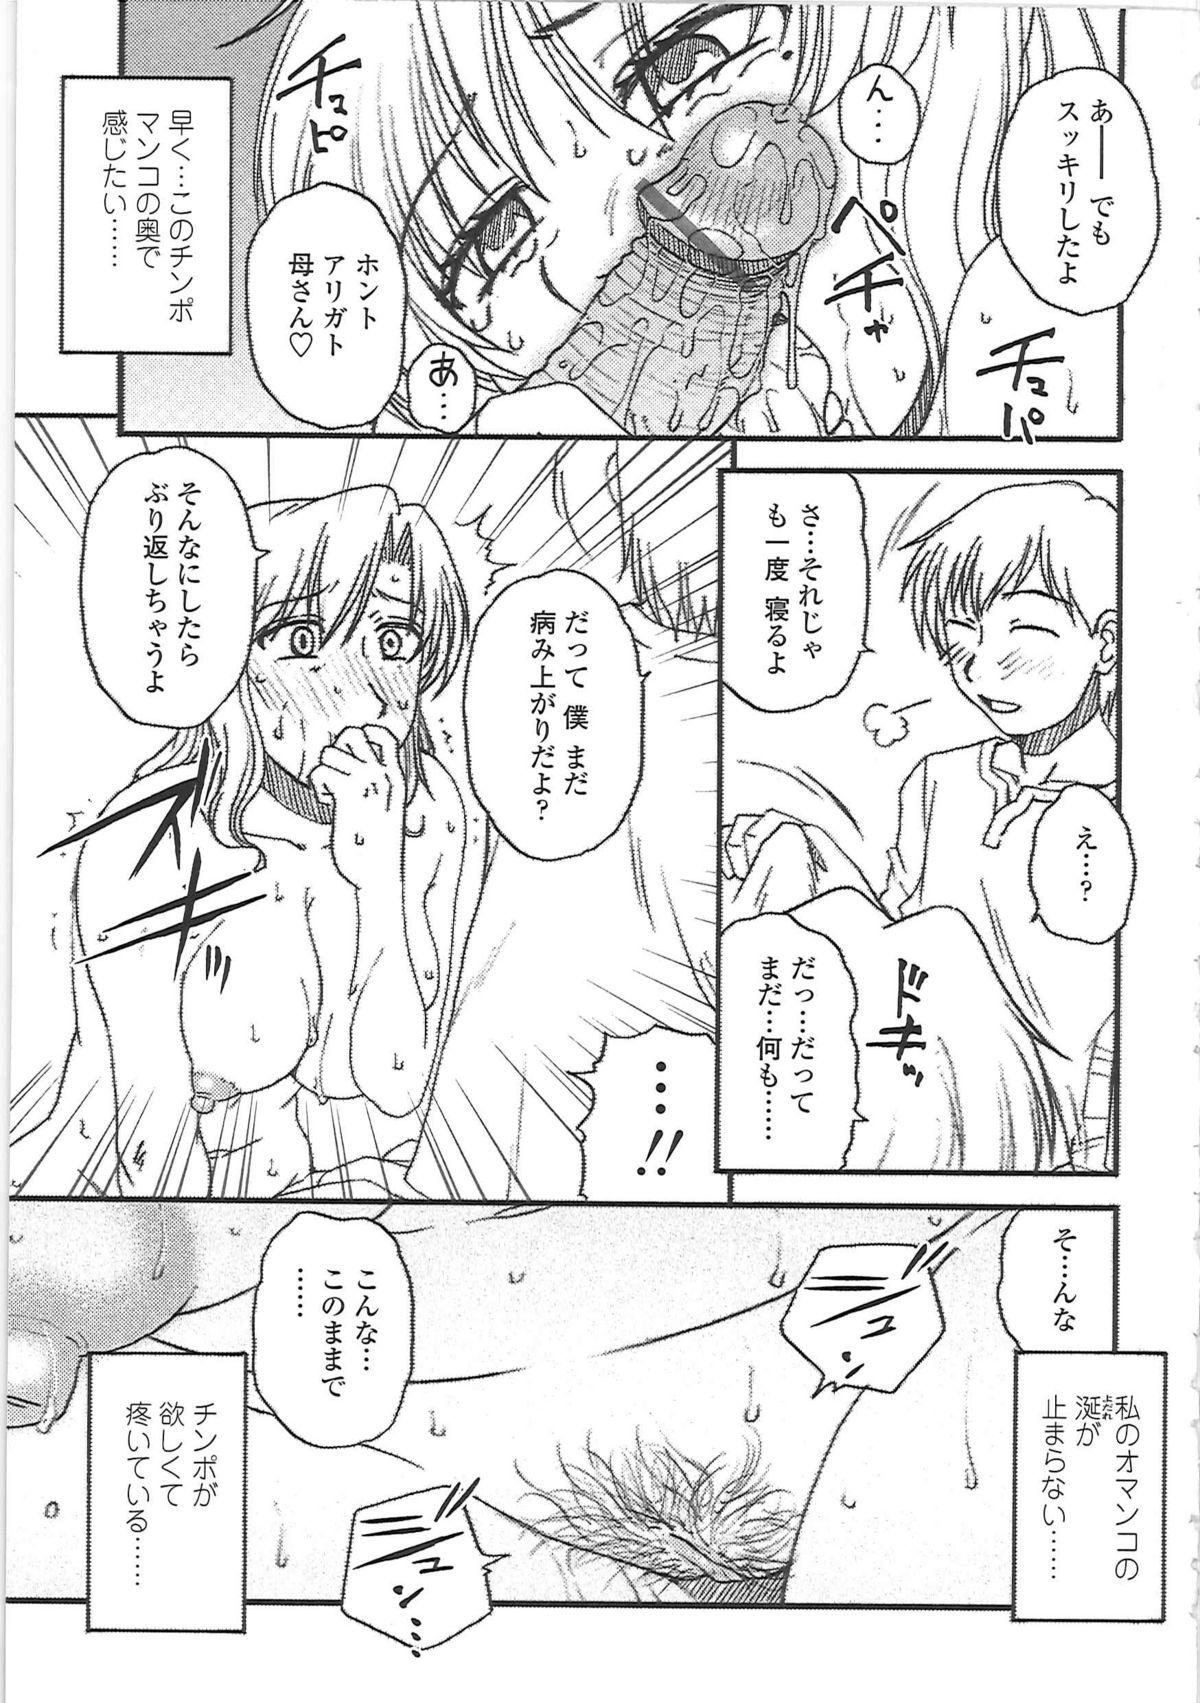 Nikuzuma Tsuushin - Erotic Wife Communication 183